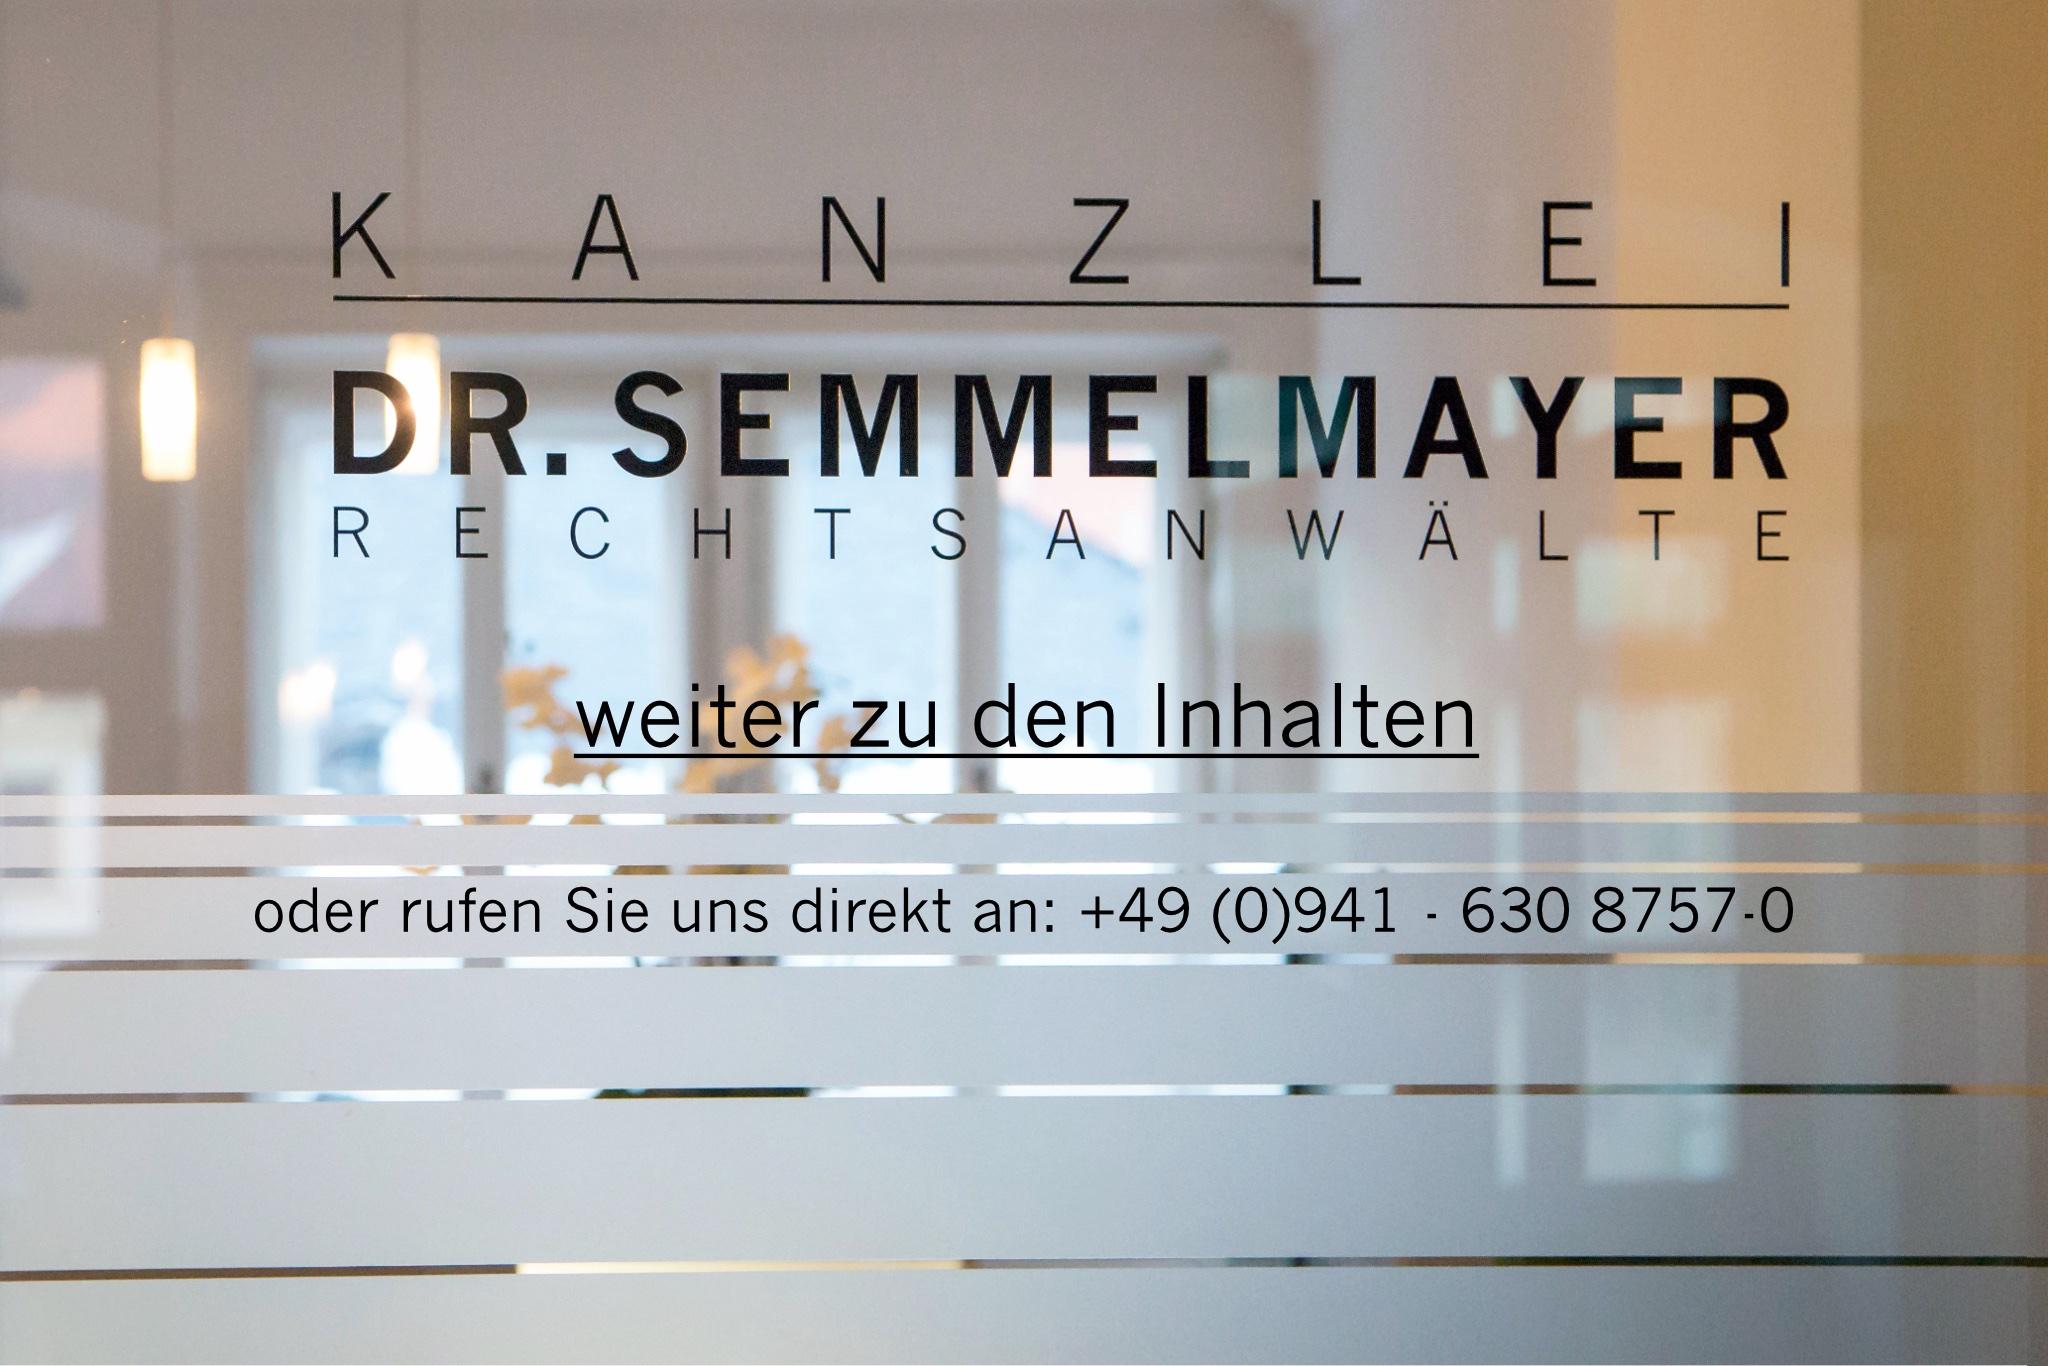 Landingpage Kanzlei Dr. Semmelmayer